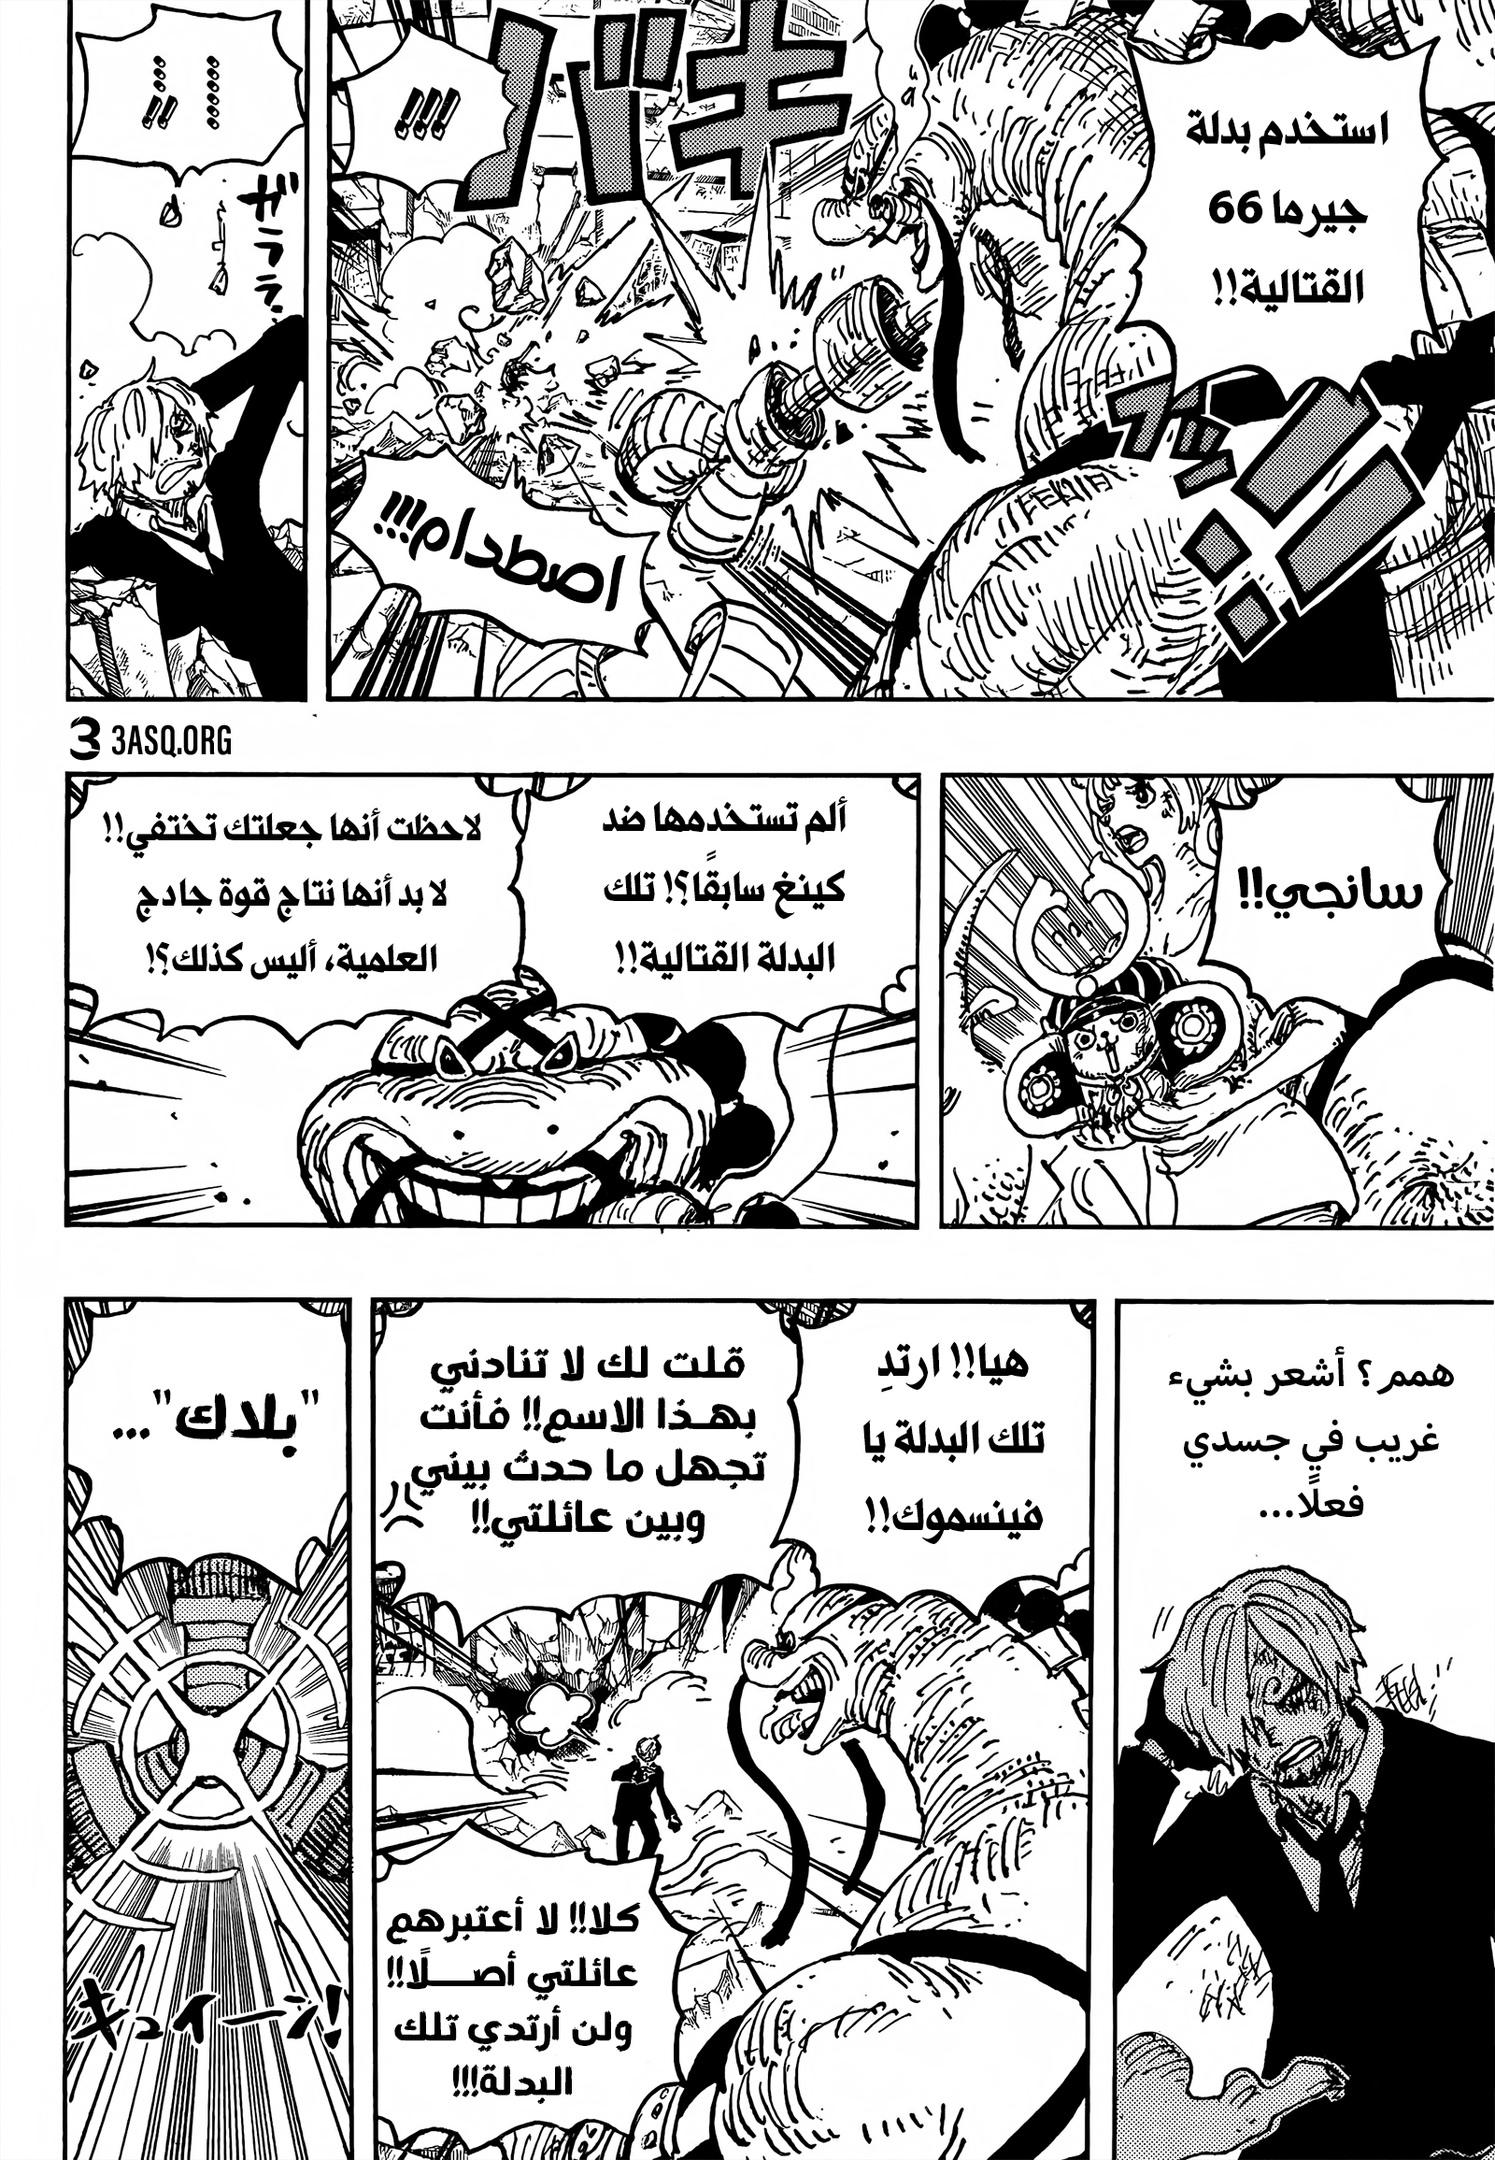 Arab One Piece 1028, image №10